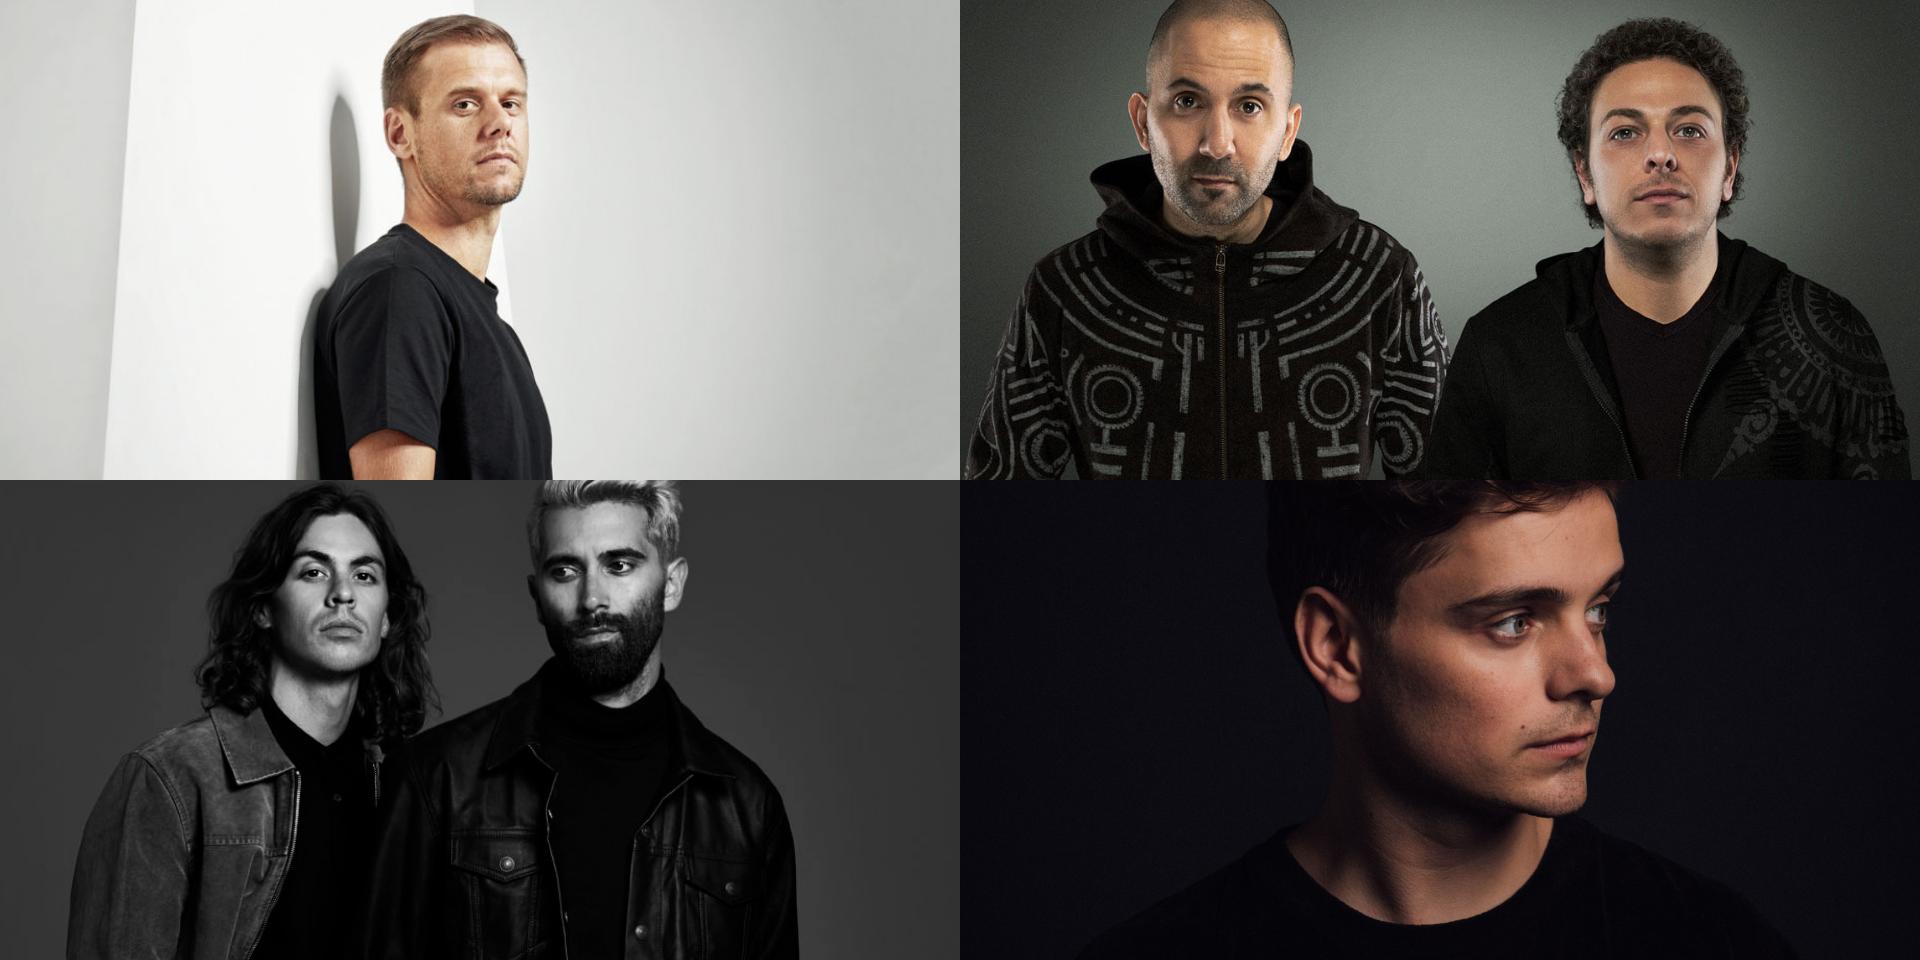 Martin Garrix, Vini Vici, Armin Van Buuren, Yellow Claw, and more to perform at Djakarta Warehouse Project Virtual